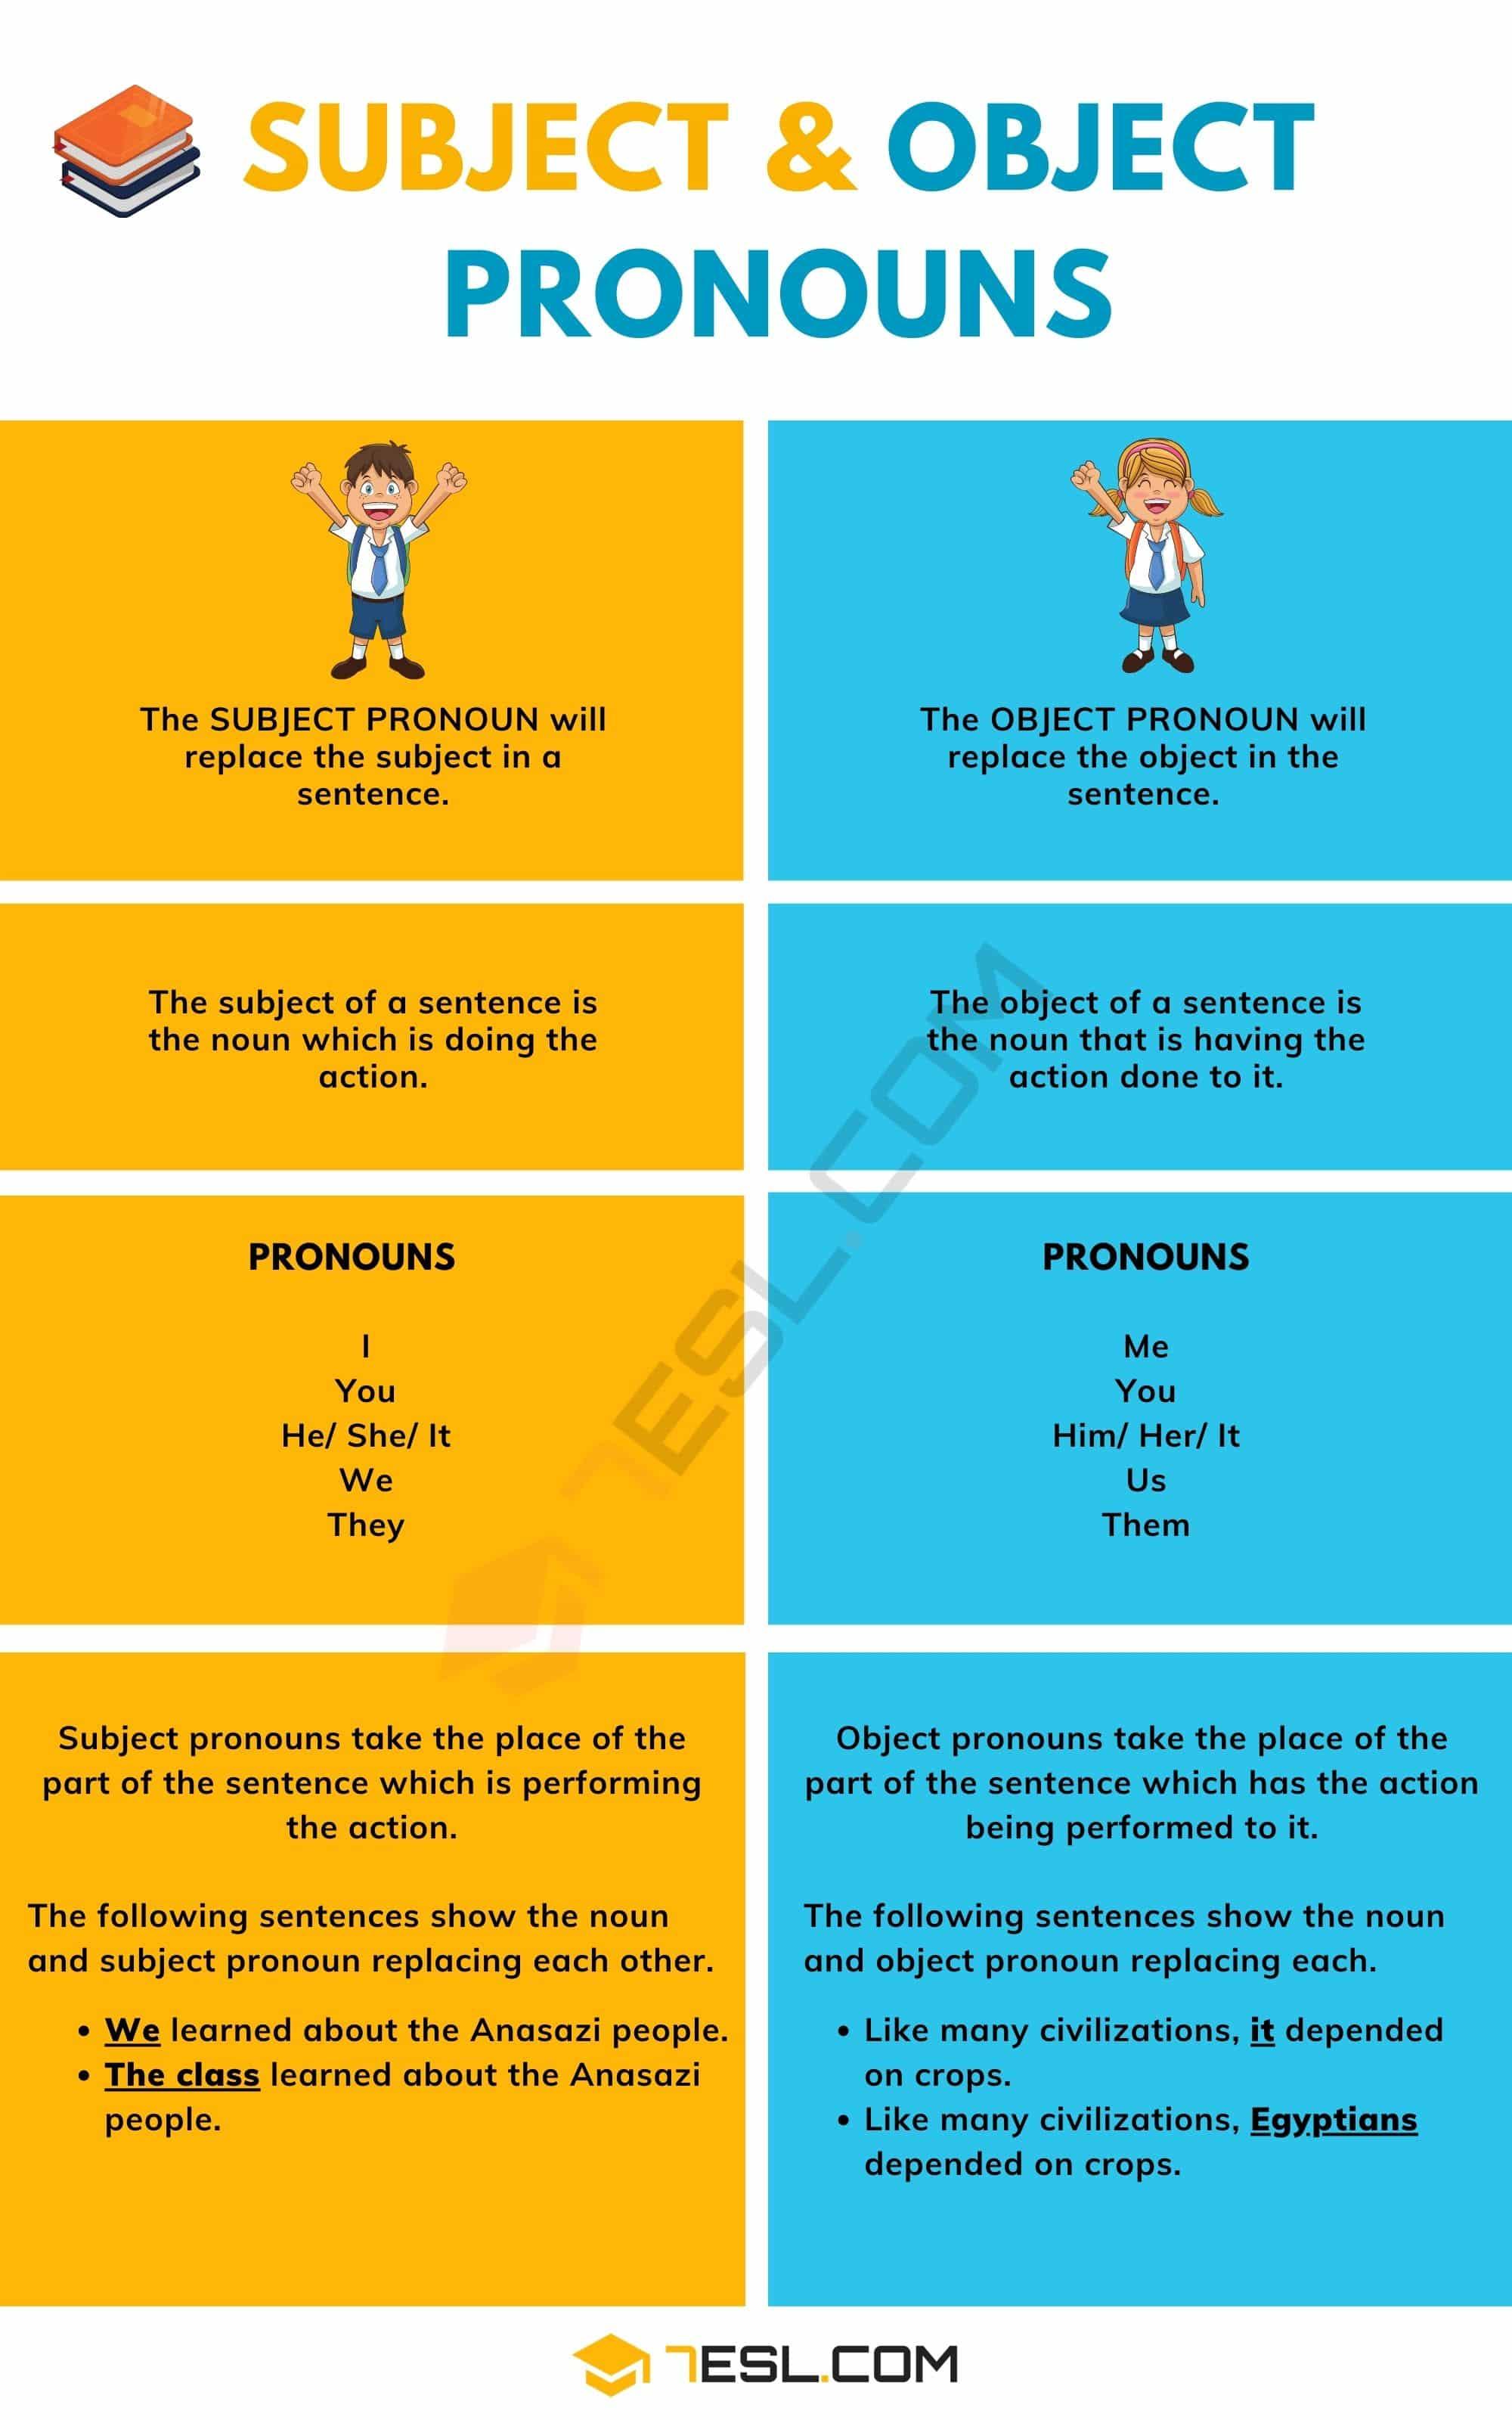 Subject Pronouns and Object Pronouns